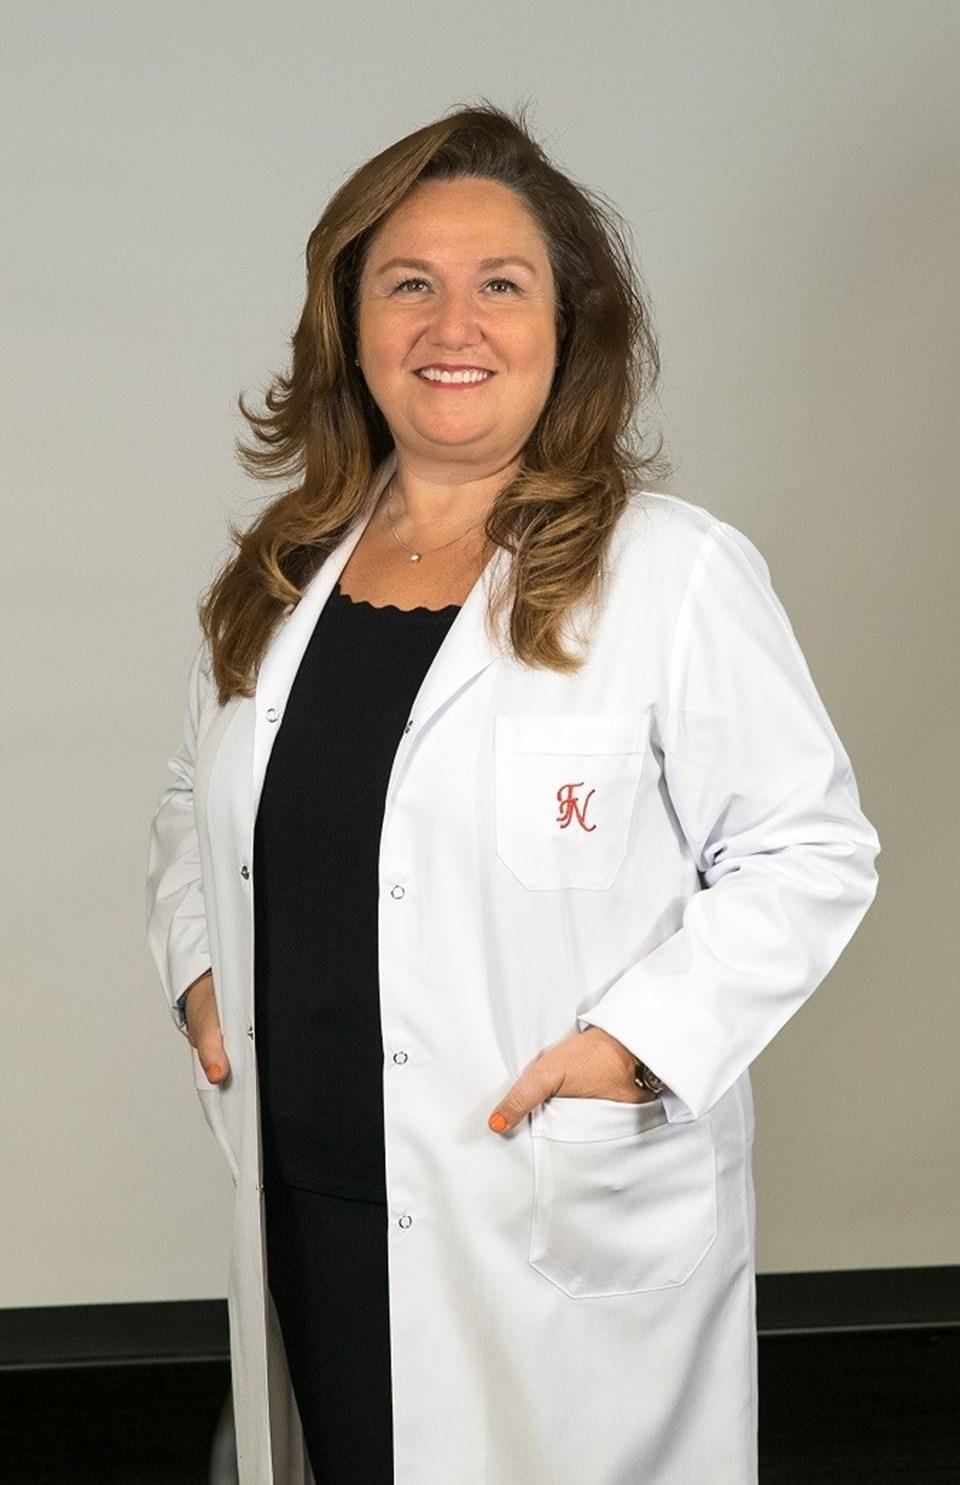 Uzm. Dr. Lale Seren